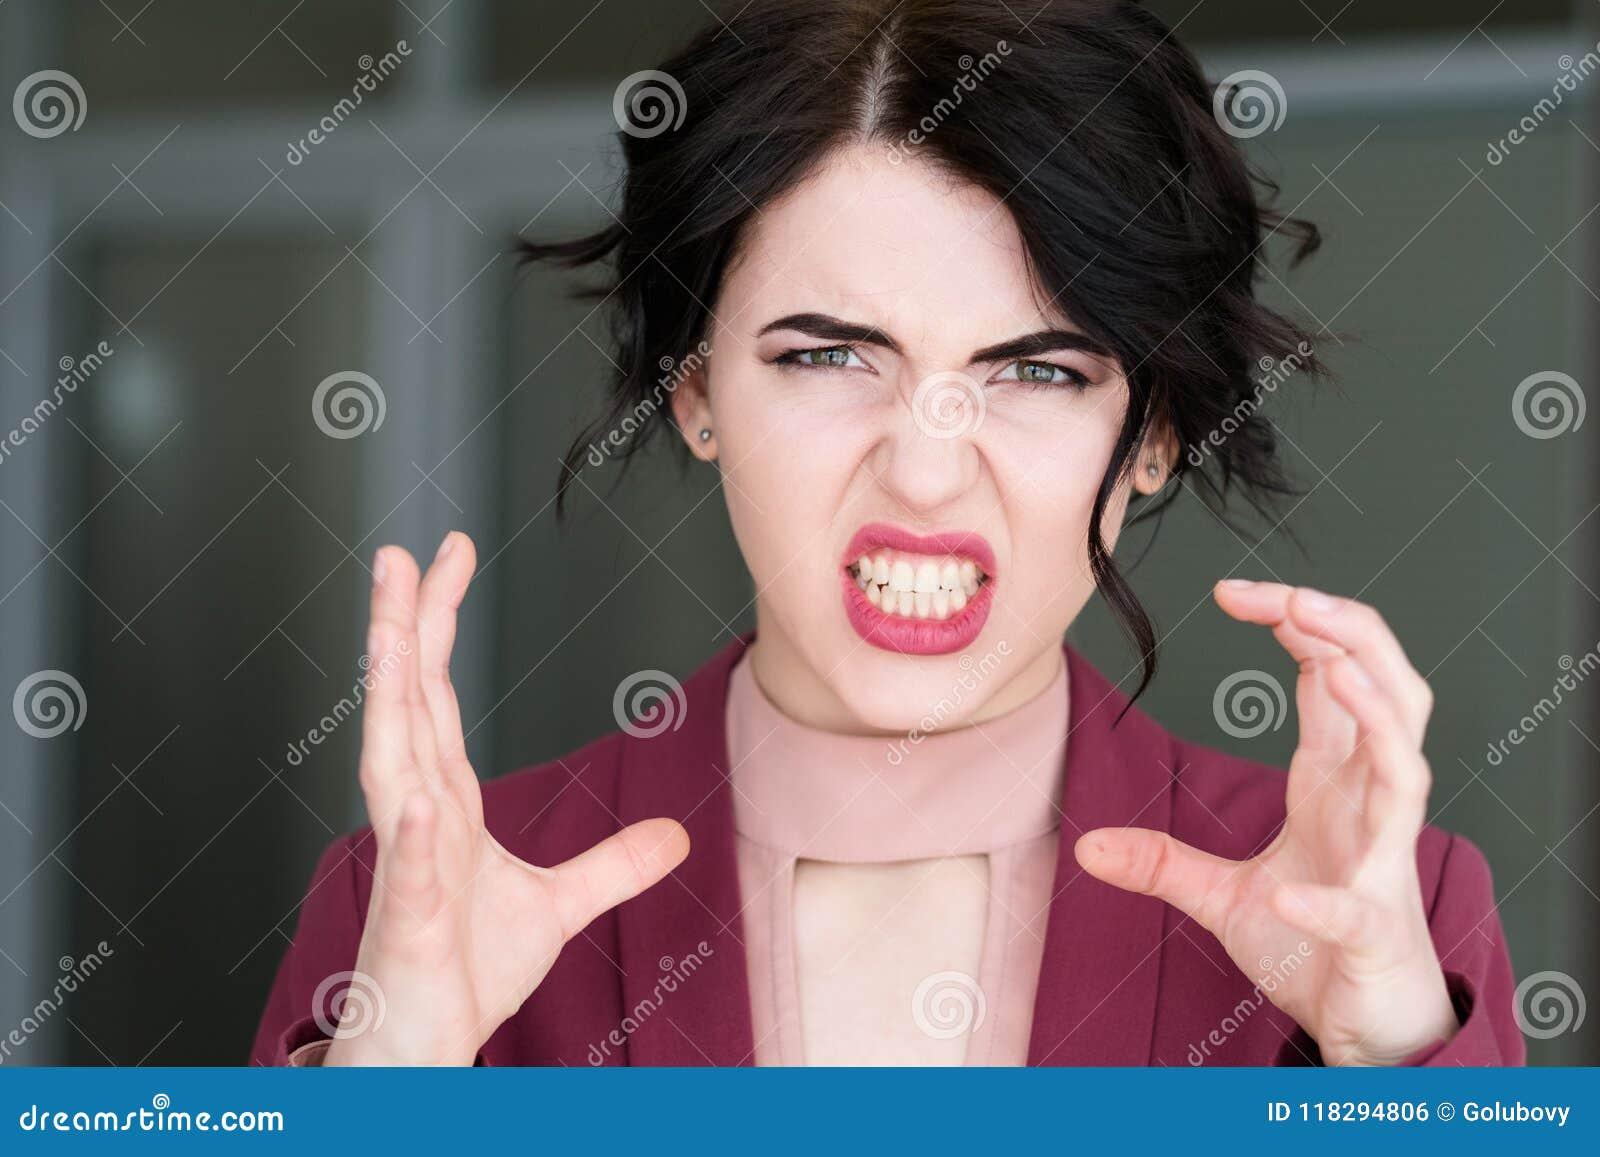 Emotion face rage fury strangle woman baring teeth